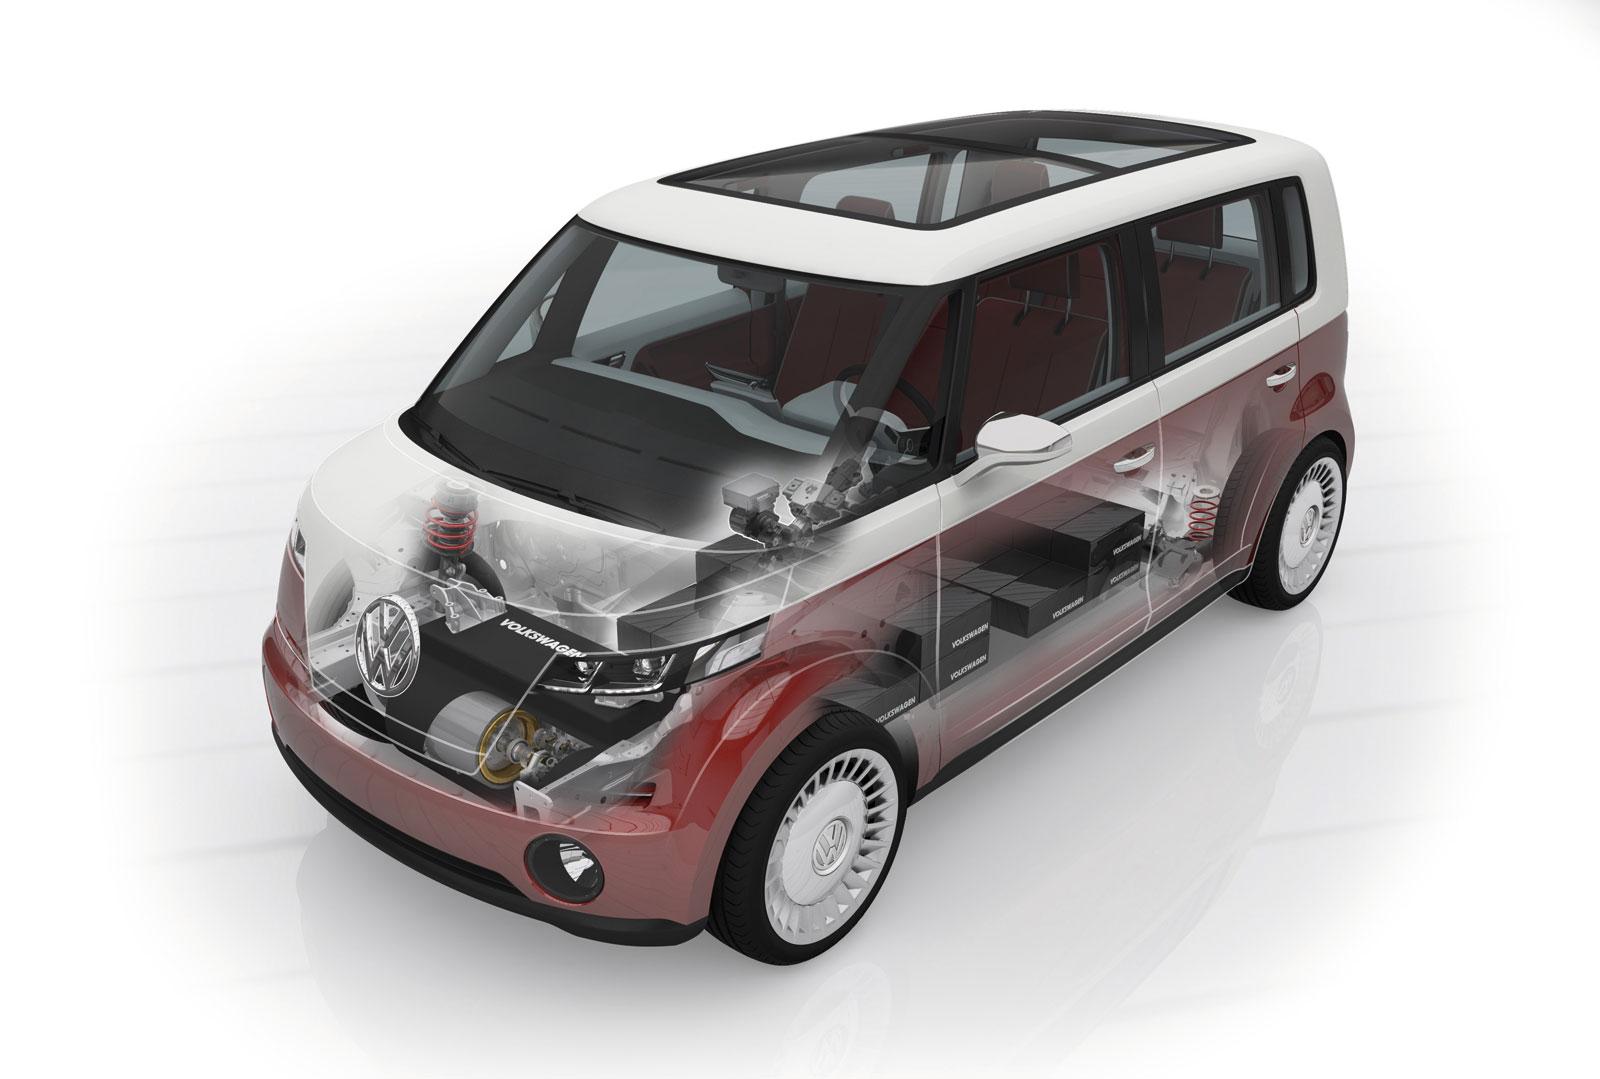 http://1.bp.blogspot.com/-pwreozypToI/T-N6LoFGvLI/AAAAAAAAD2s/C0Gd75nK8Go/s1600/Volkswagen+Bulli+Concept+Hd+Wallpapers+2011_7.jpg